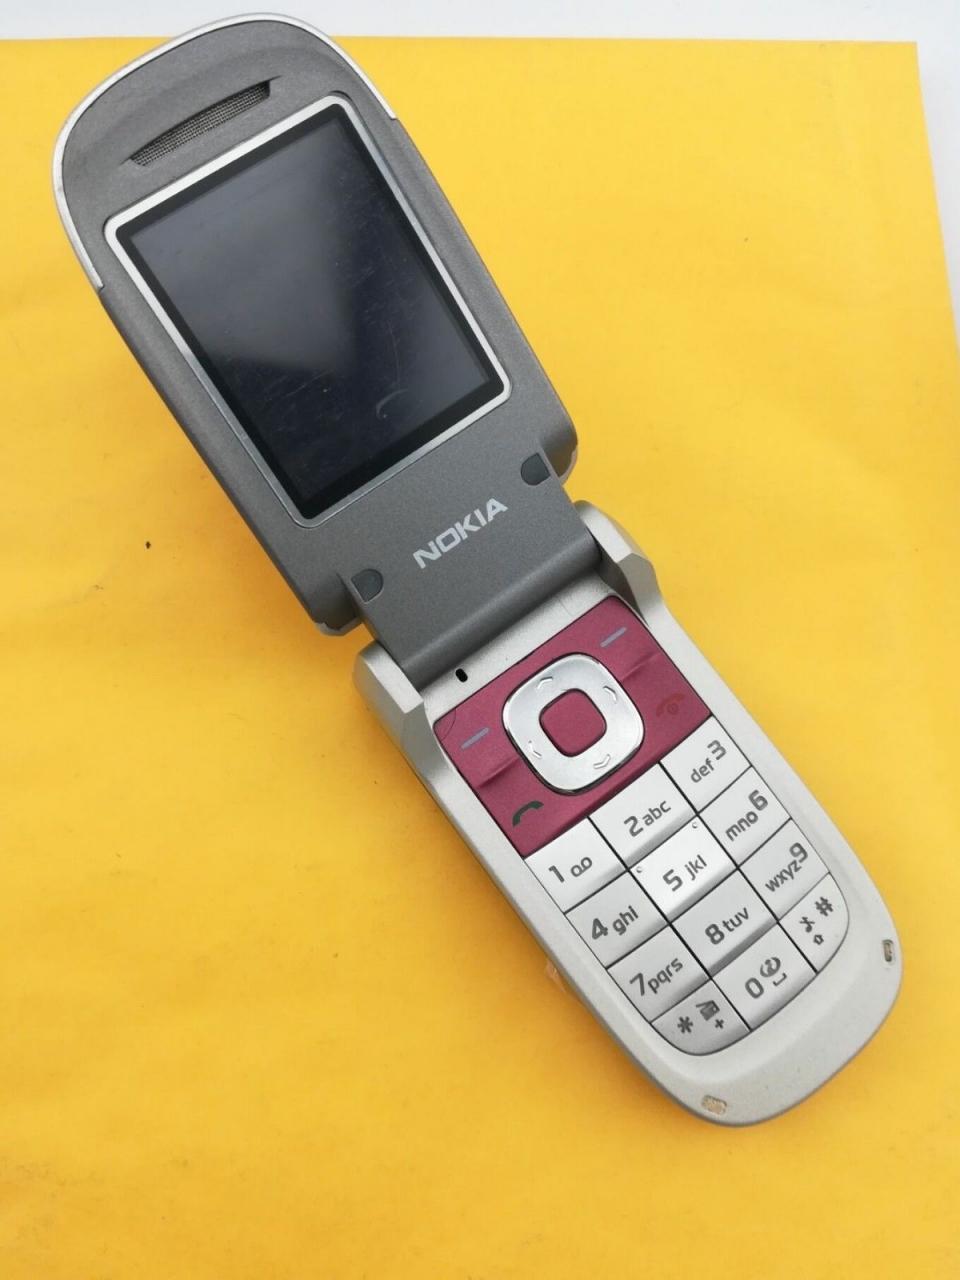 Refurbished ORIGINAL Nokia 2760 Blue Silver red 100% UNLOCKED Flip Cell phone sliver 6